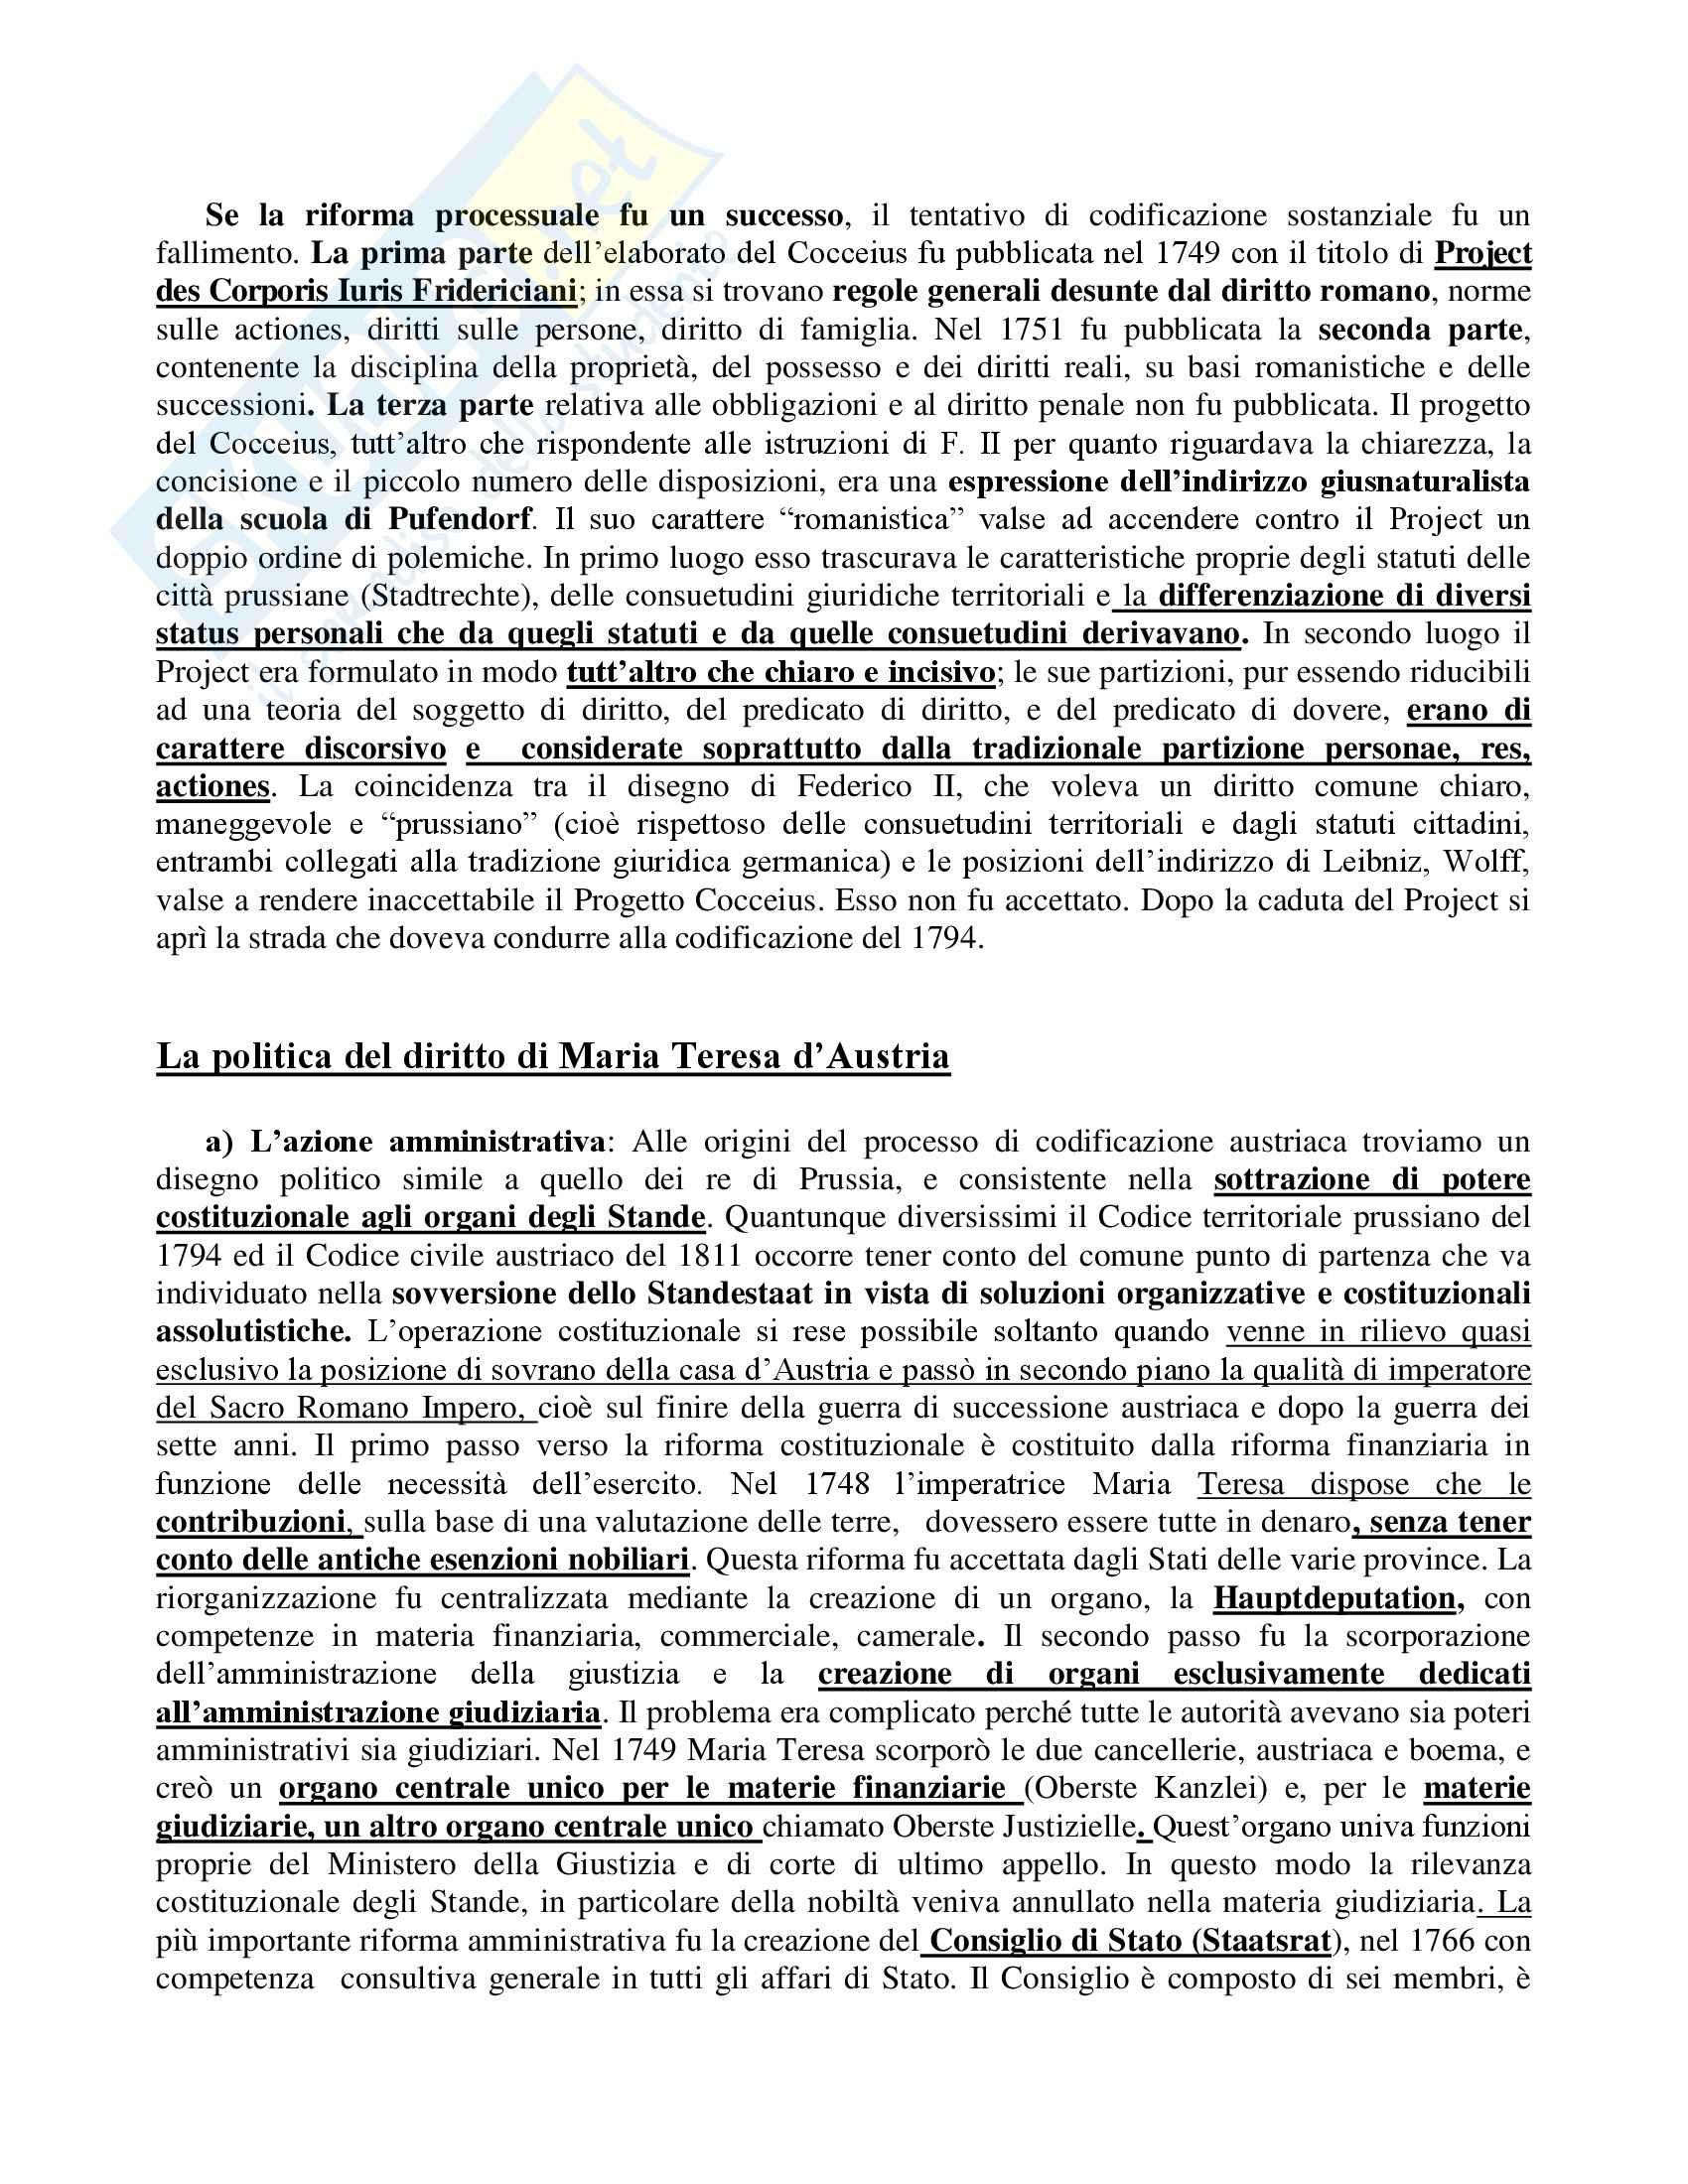 Storia del diritto medievale e moderno - parte Moderna Pag. 16